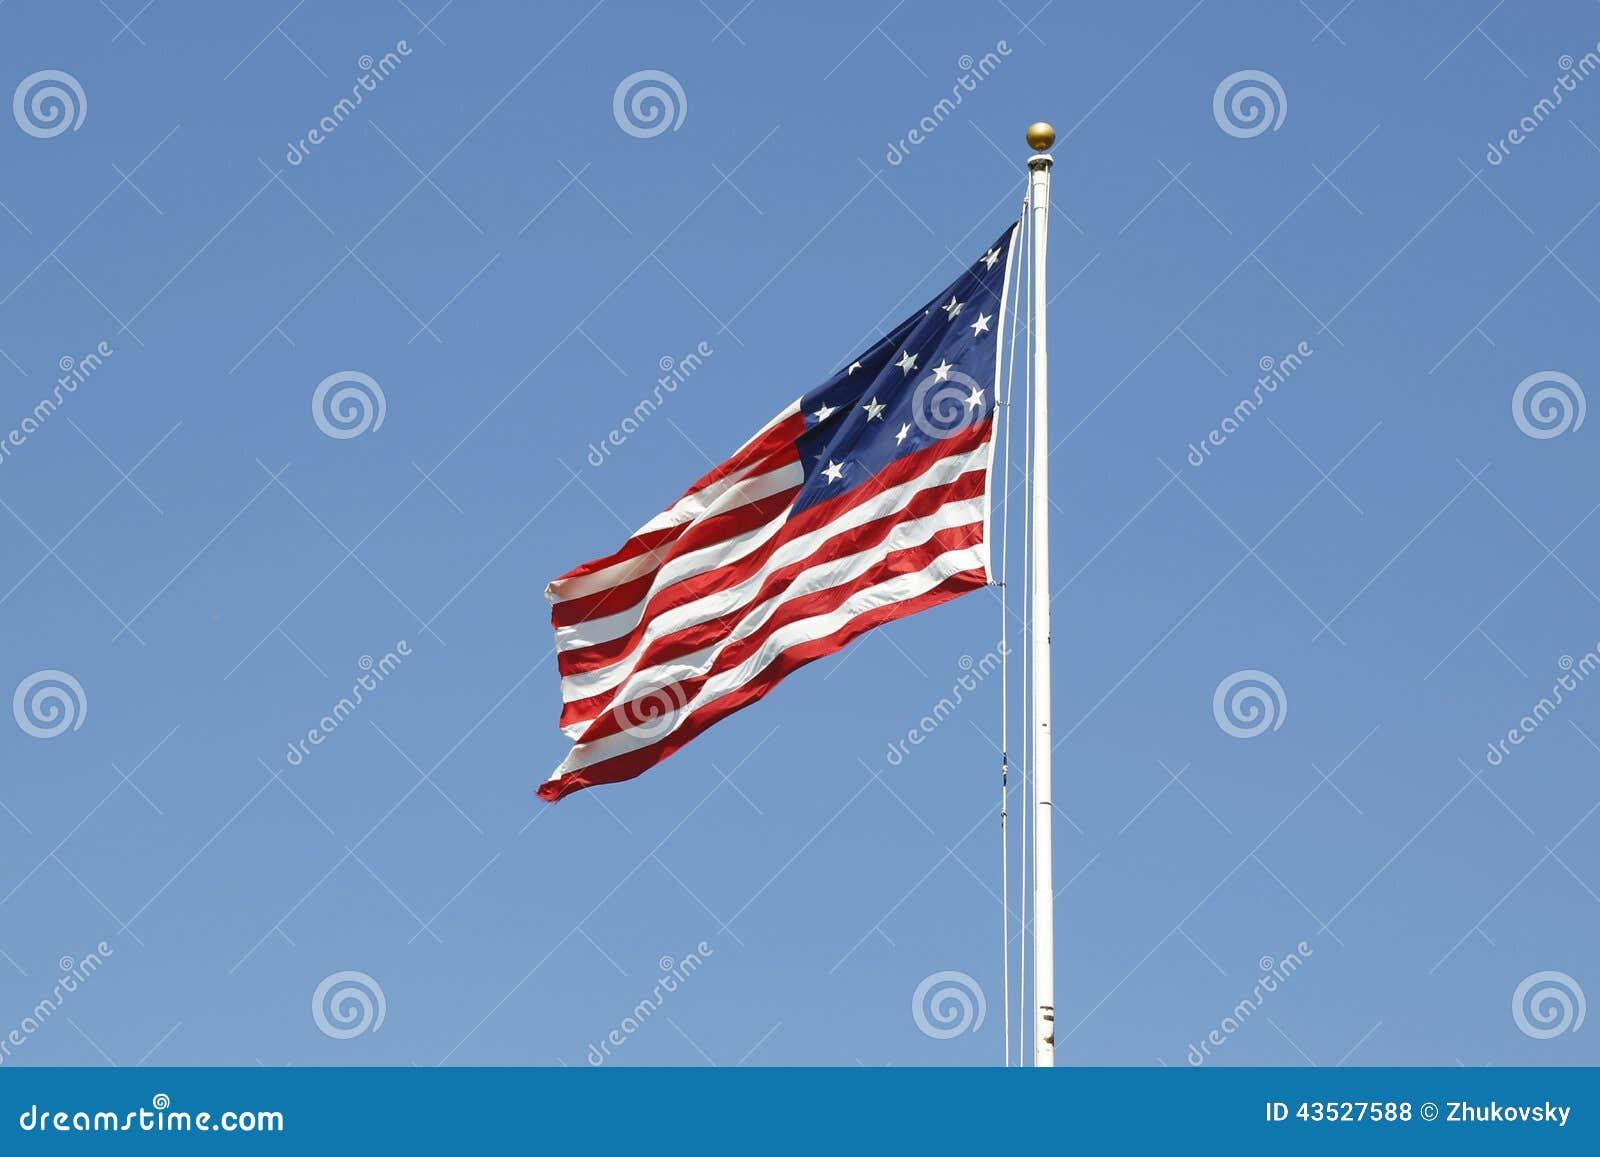 La estrella de la raya 15-star 15 Spangled la bandera americana de la bandera